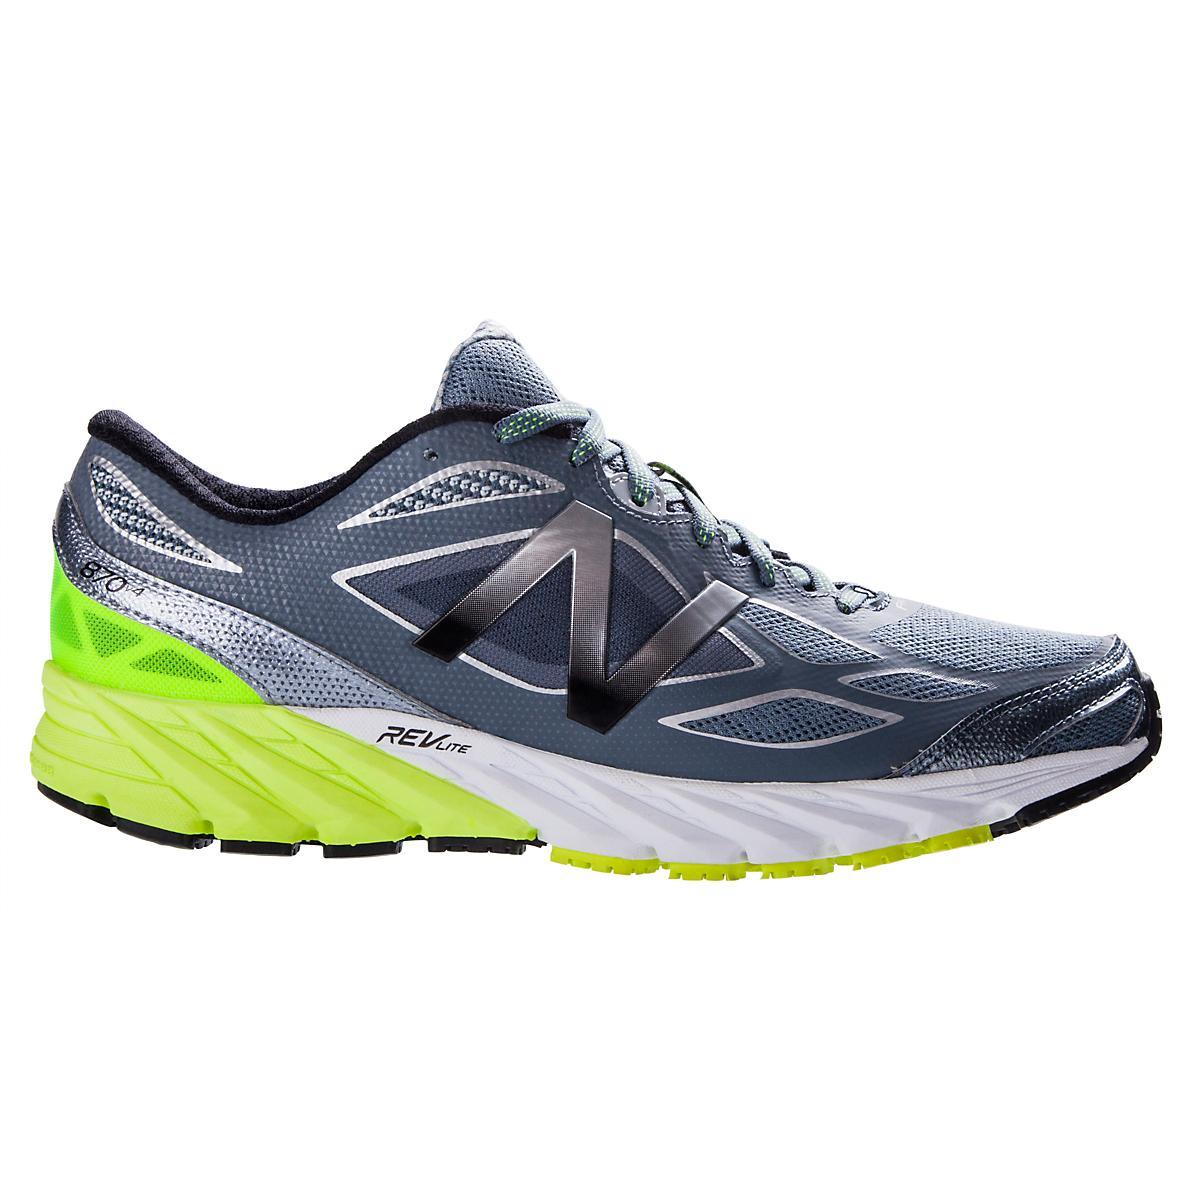 e731df3e4c6b Mens New Balance 870v4 Running Shoe at Road Runner Sports